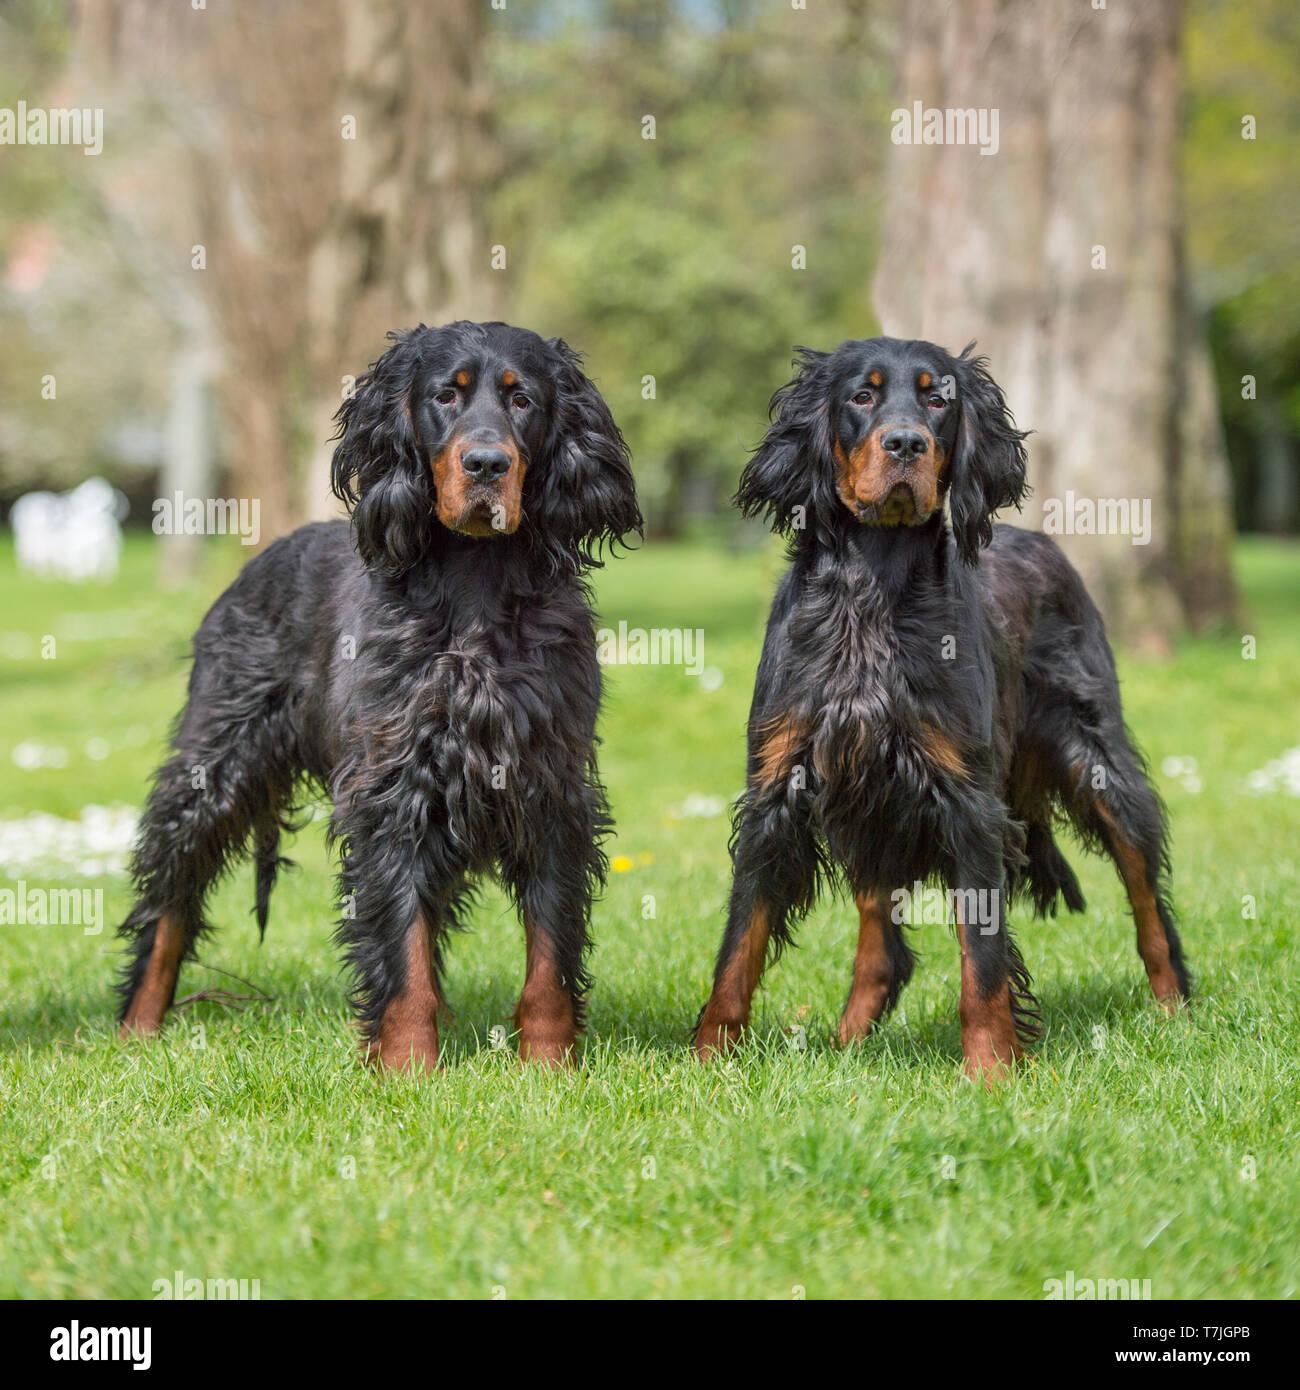 two gordon setter dogs - Stock Image